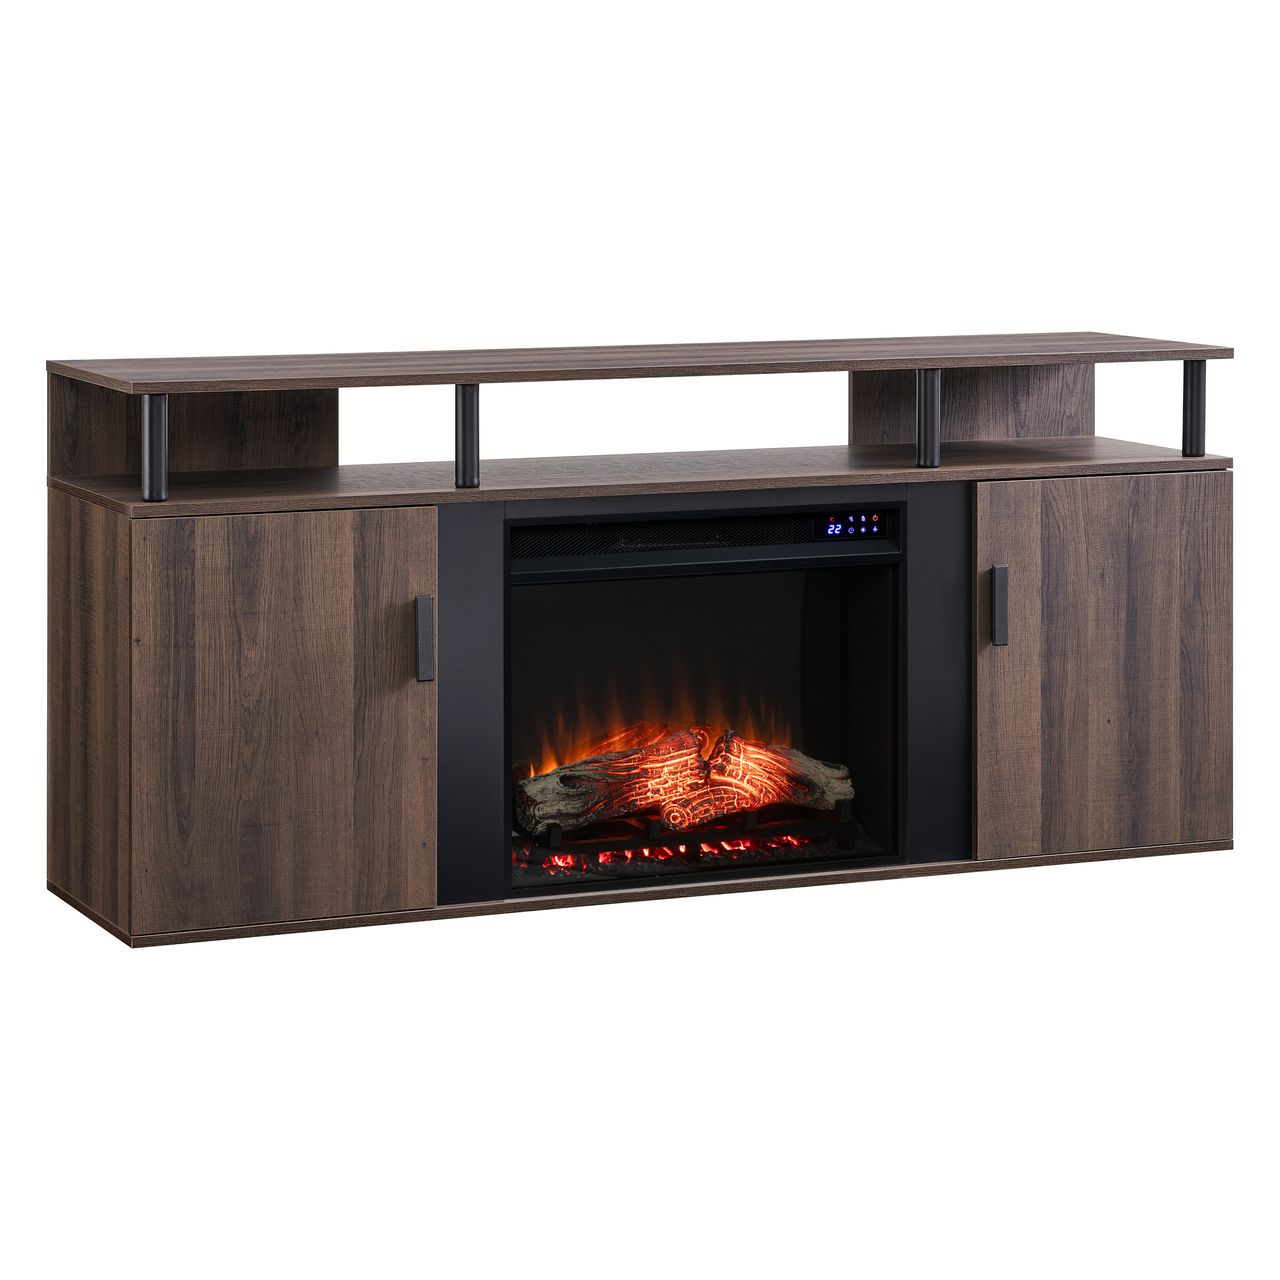 SEI Livingvale FR1010456 Media Fireplace in Brown / Black